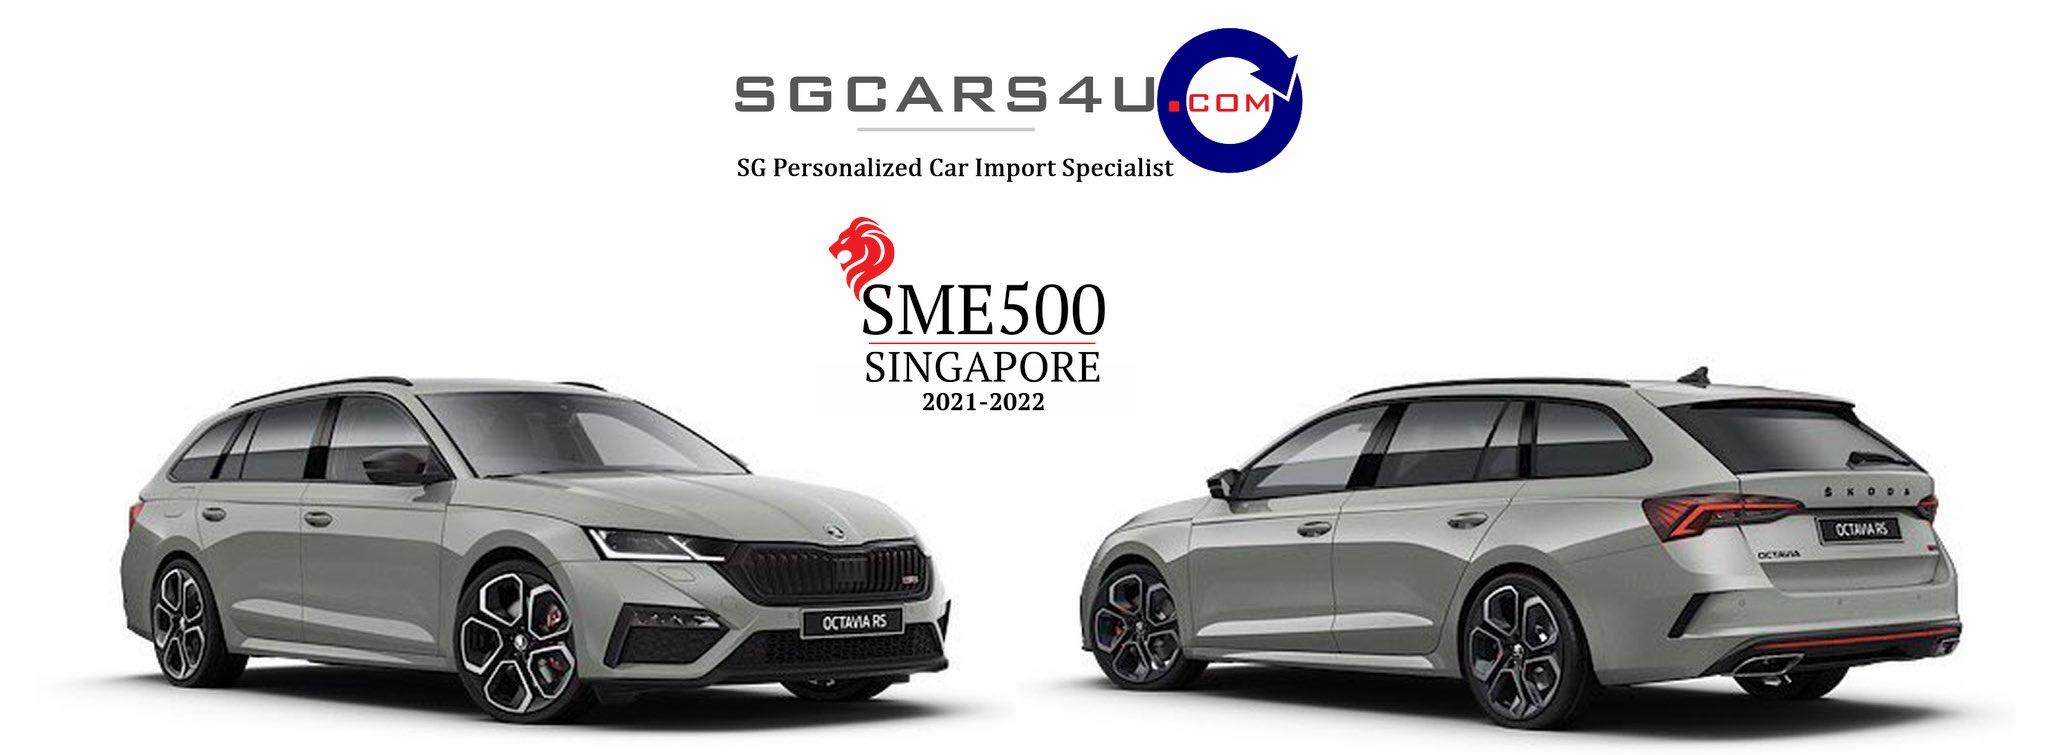 Sgcars4u.com Pte Ltd